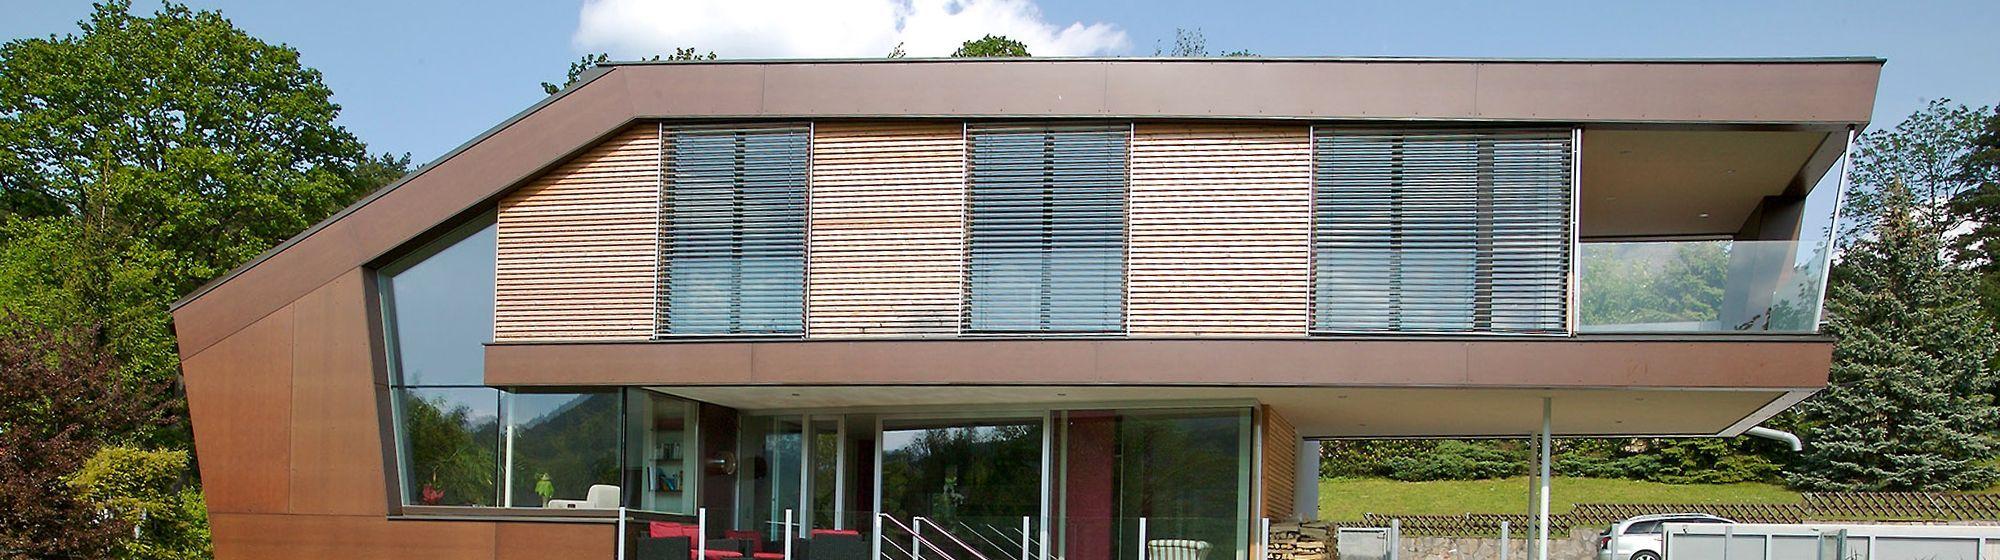 Haidbauer Holzbau - Holzhaus